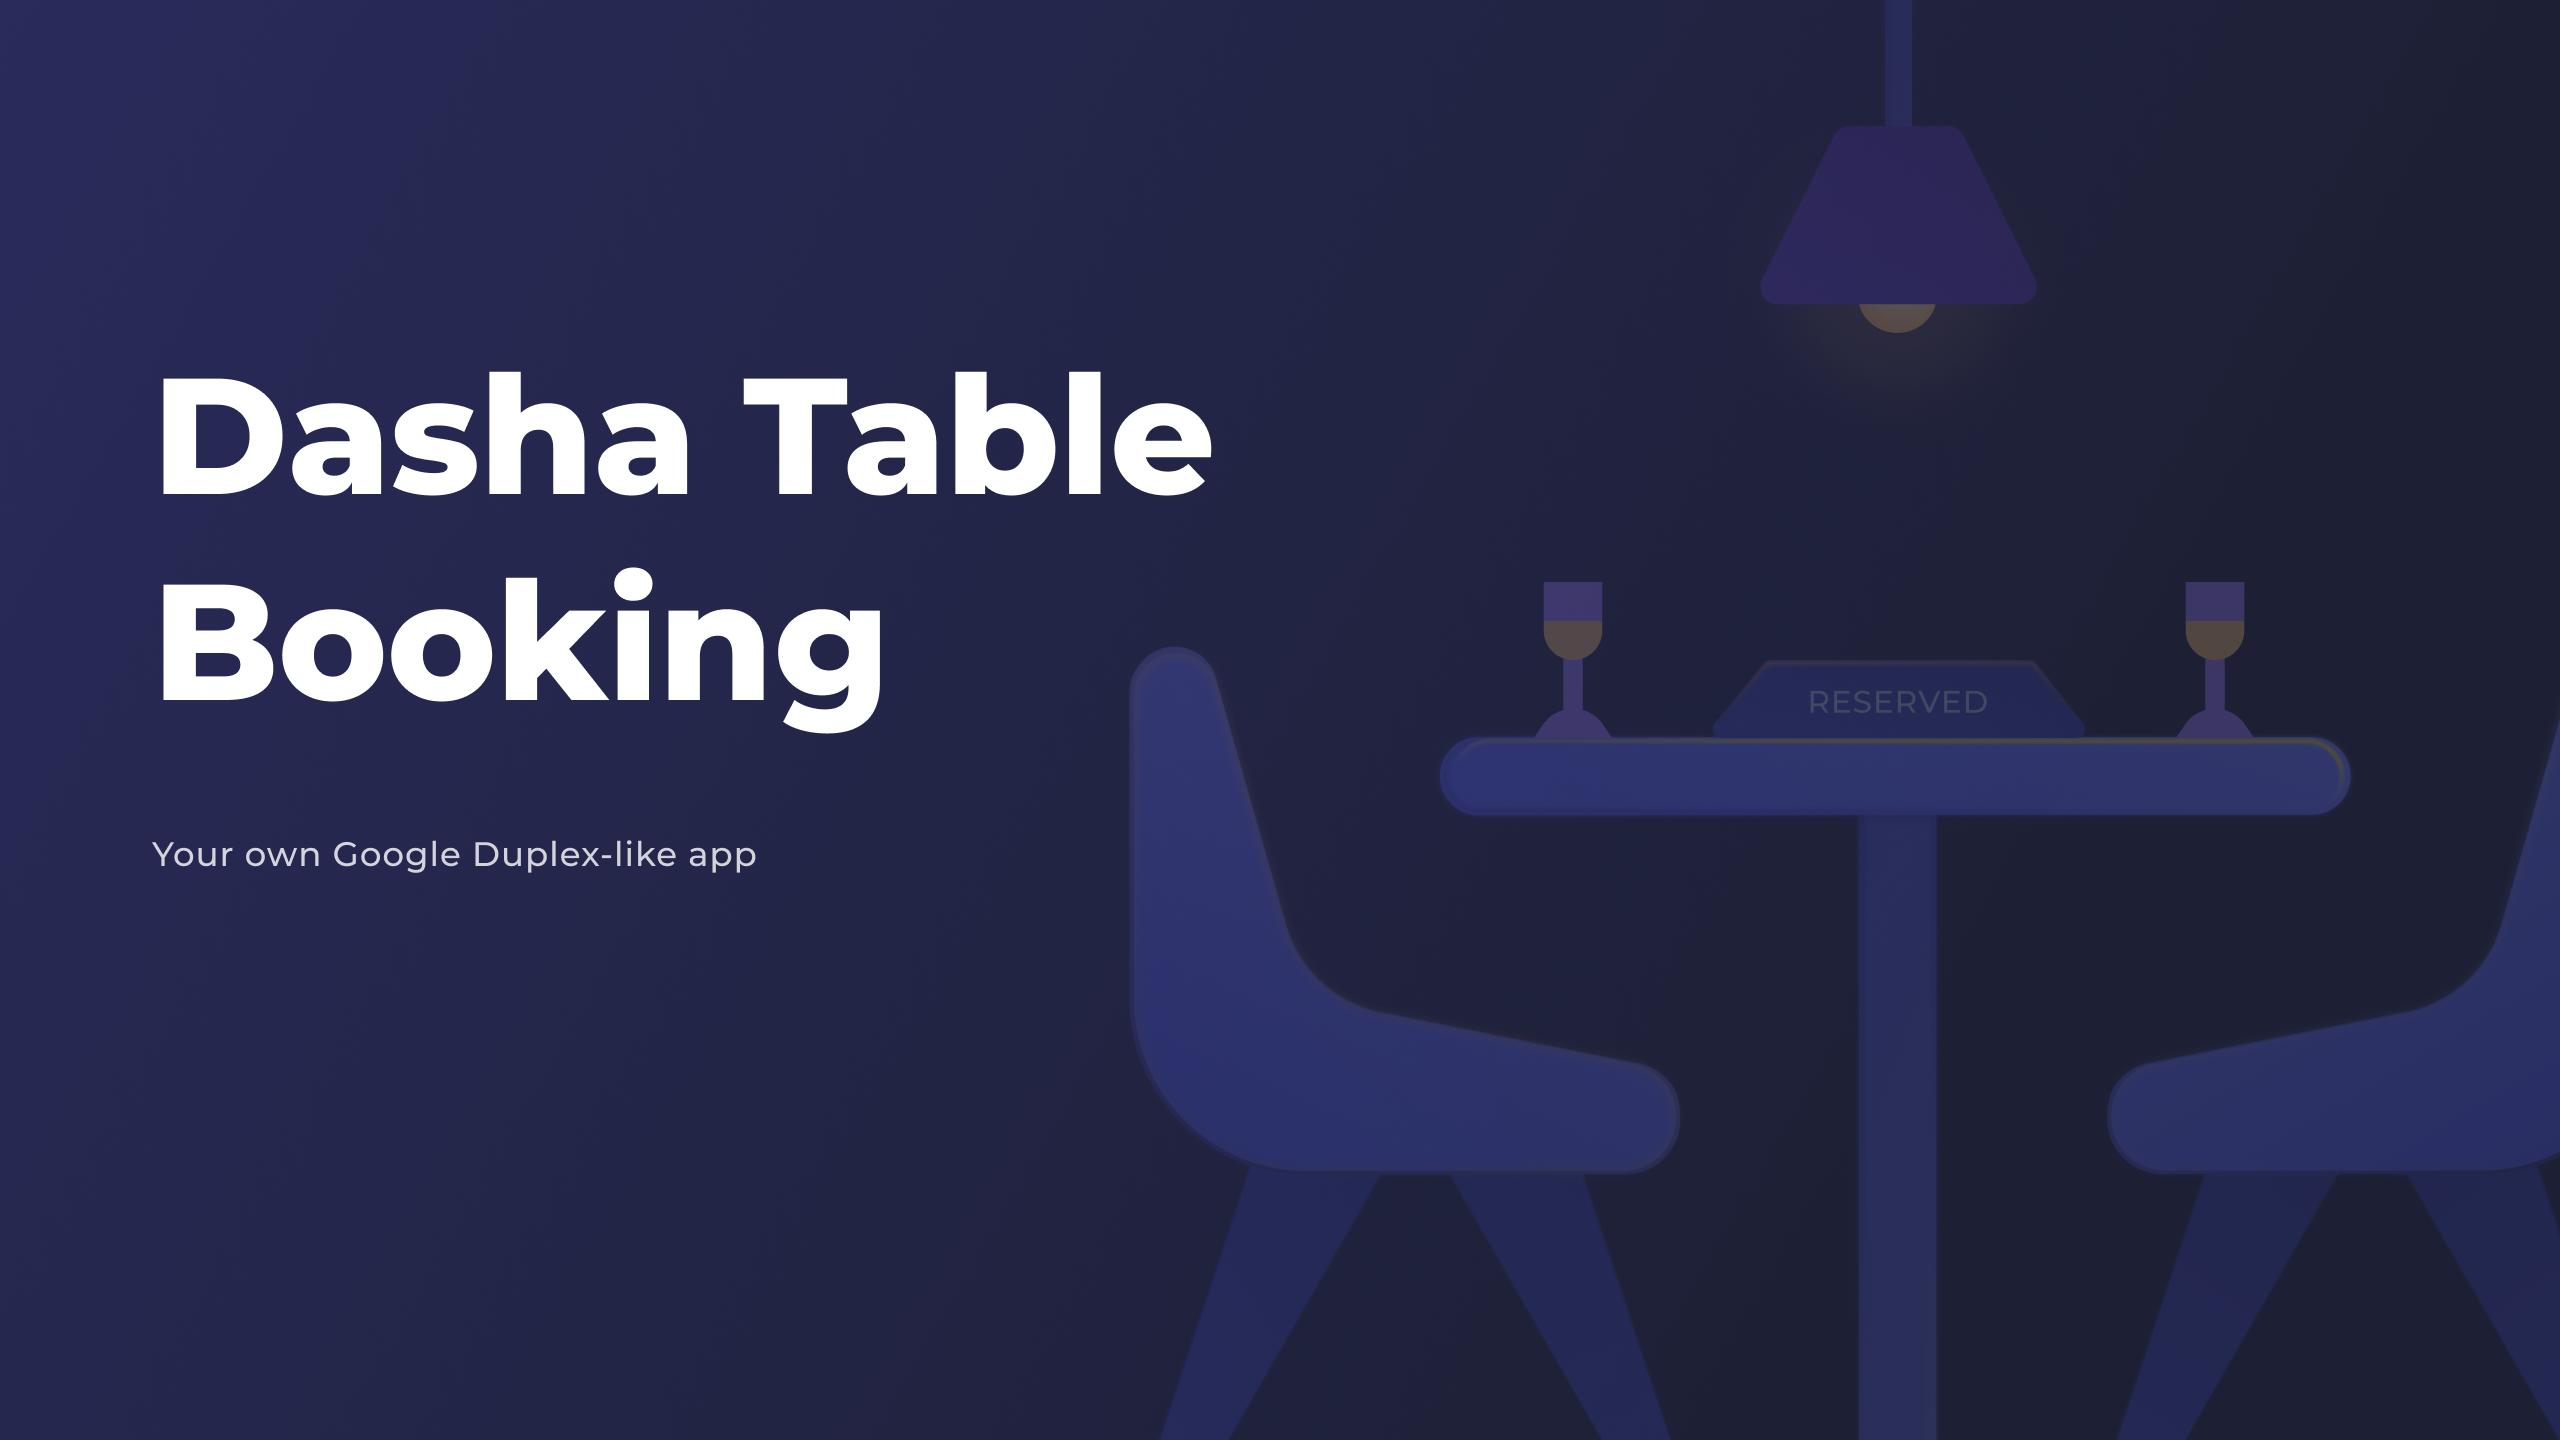 dasha-table-booking